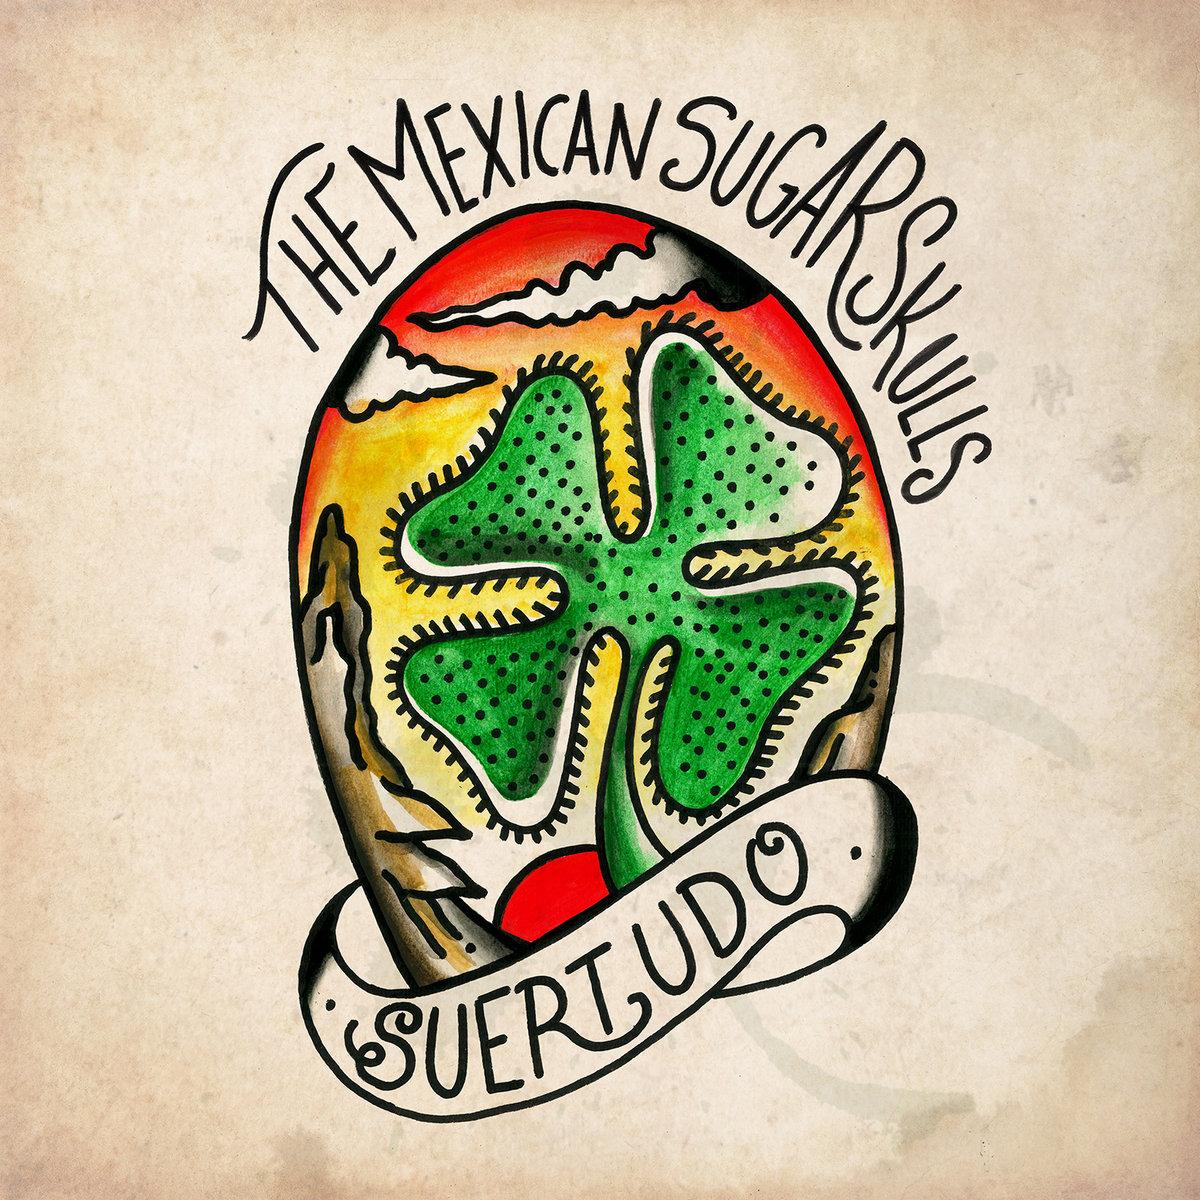 Reseña: THE MEXICAN SUGAR SKULLS.- 'Suertudo'